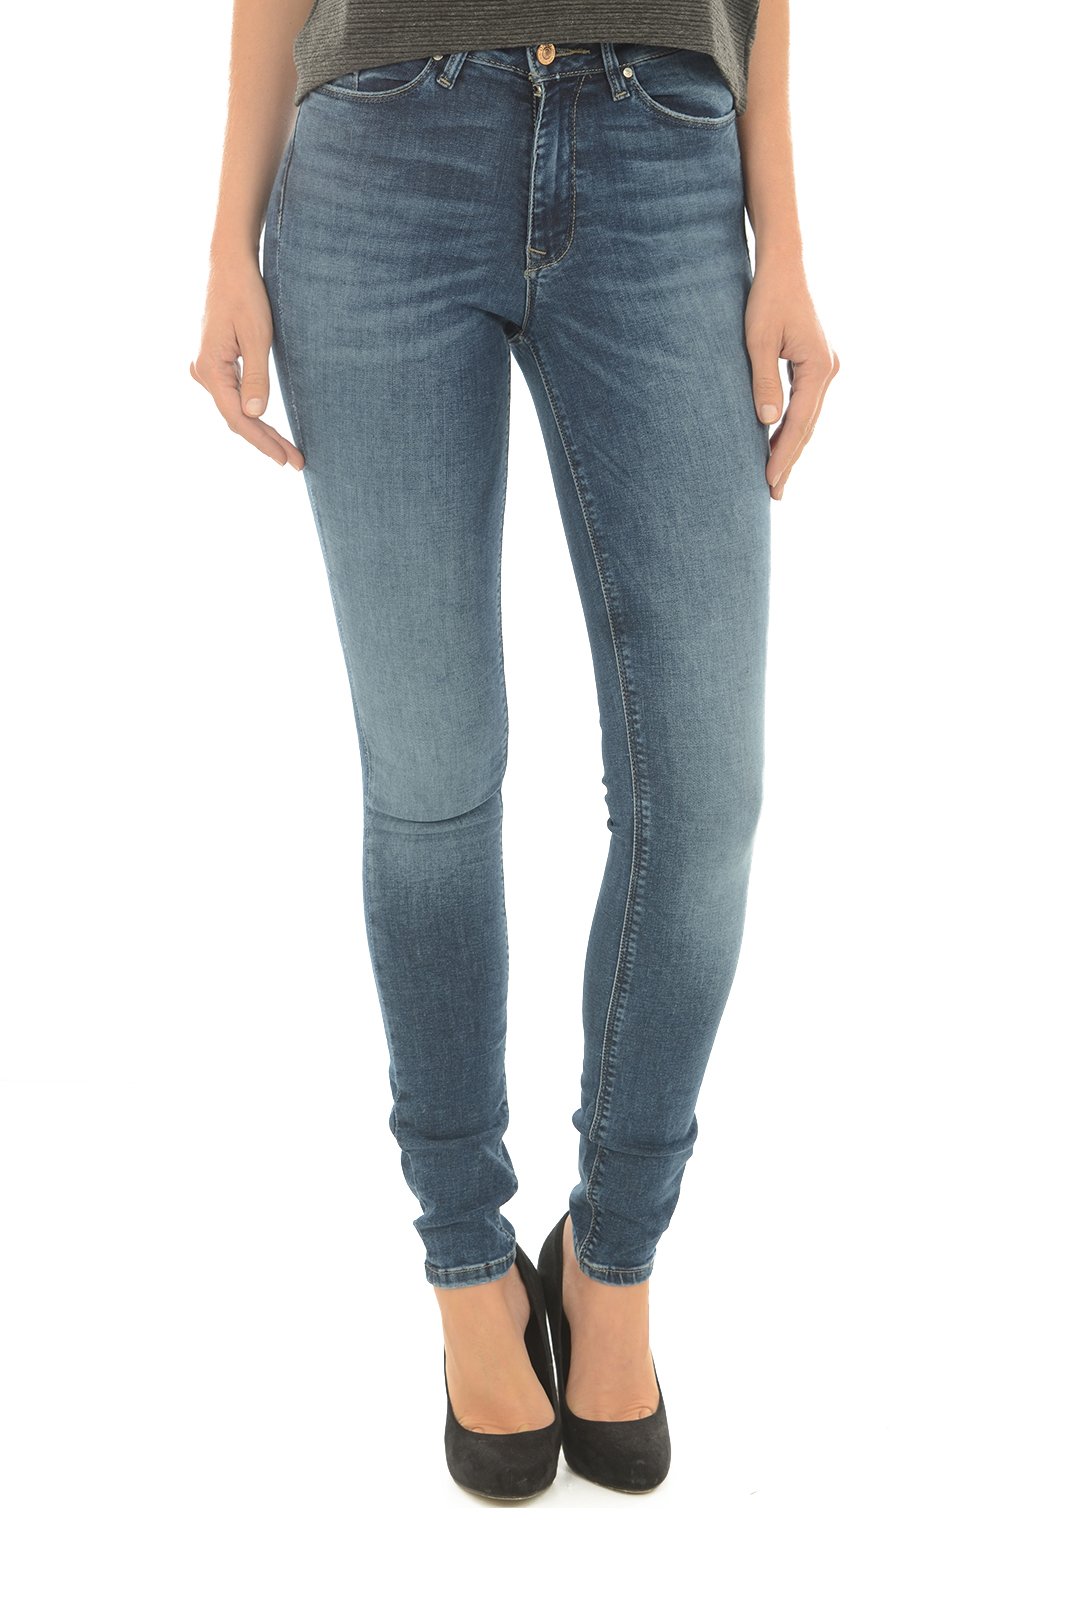 Jeans slim  Only CORIN MID WAIST SK JEANS CRE172475 MEDIUM BLUE DENIM